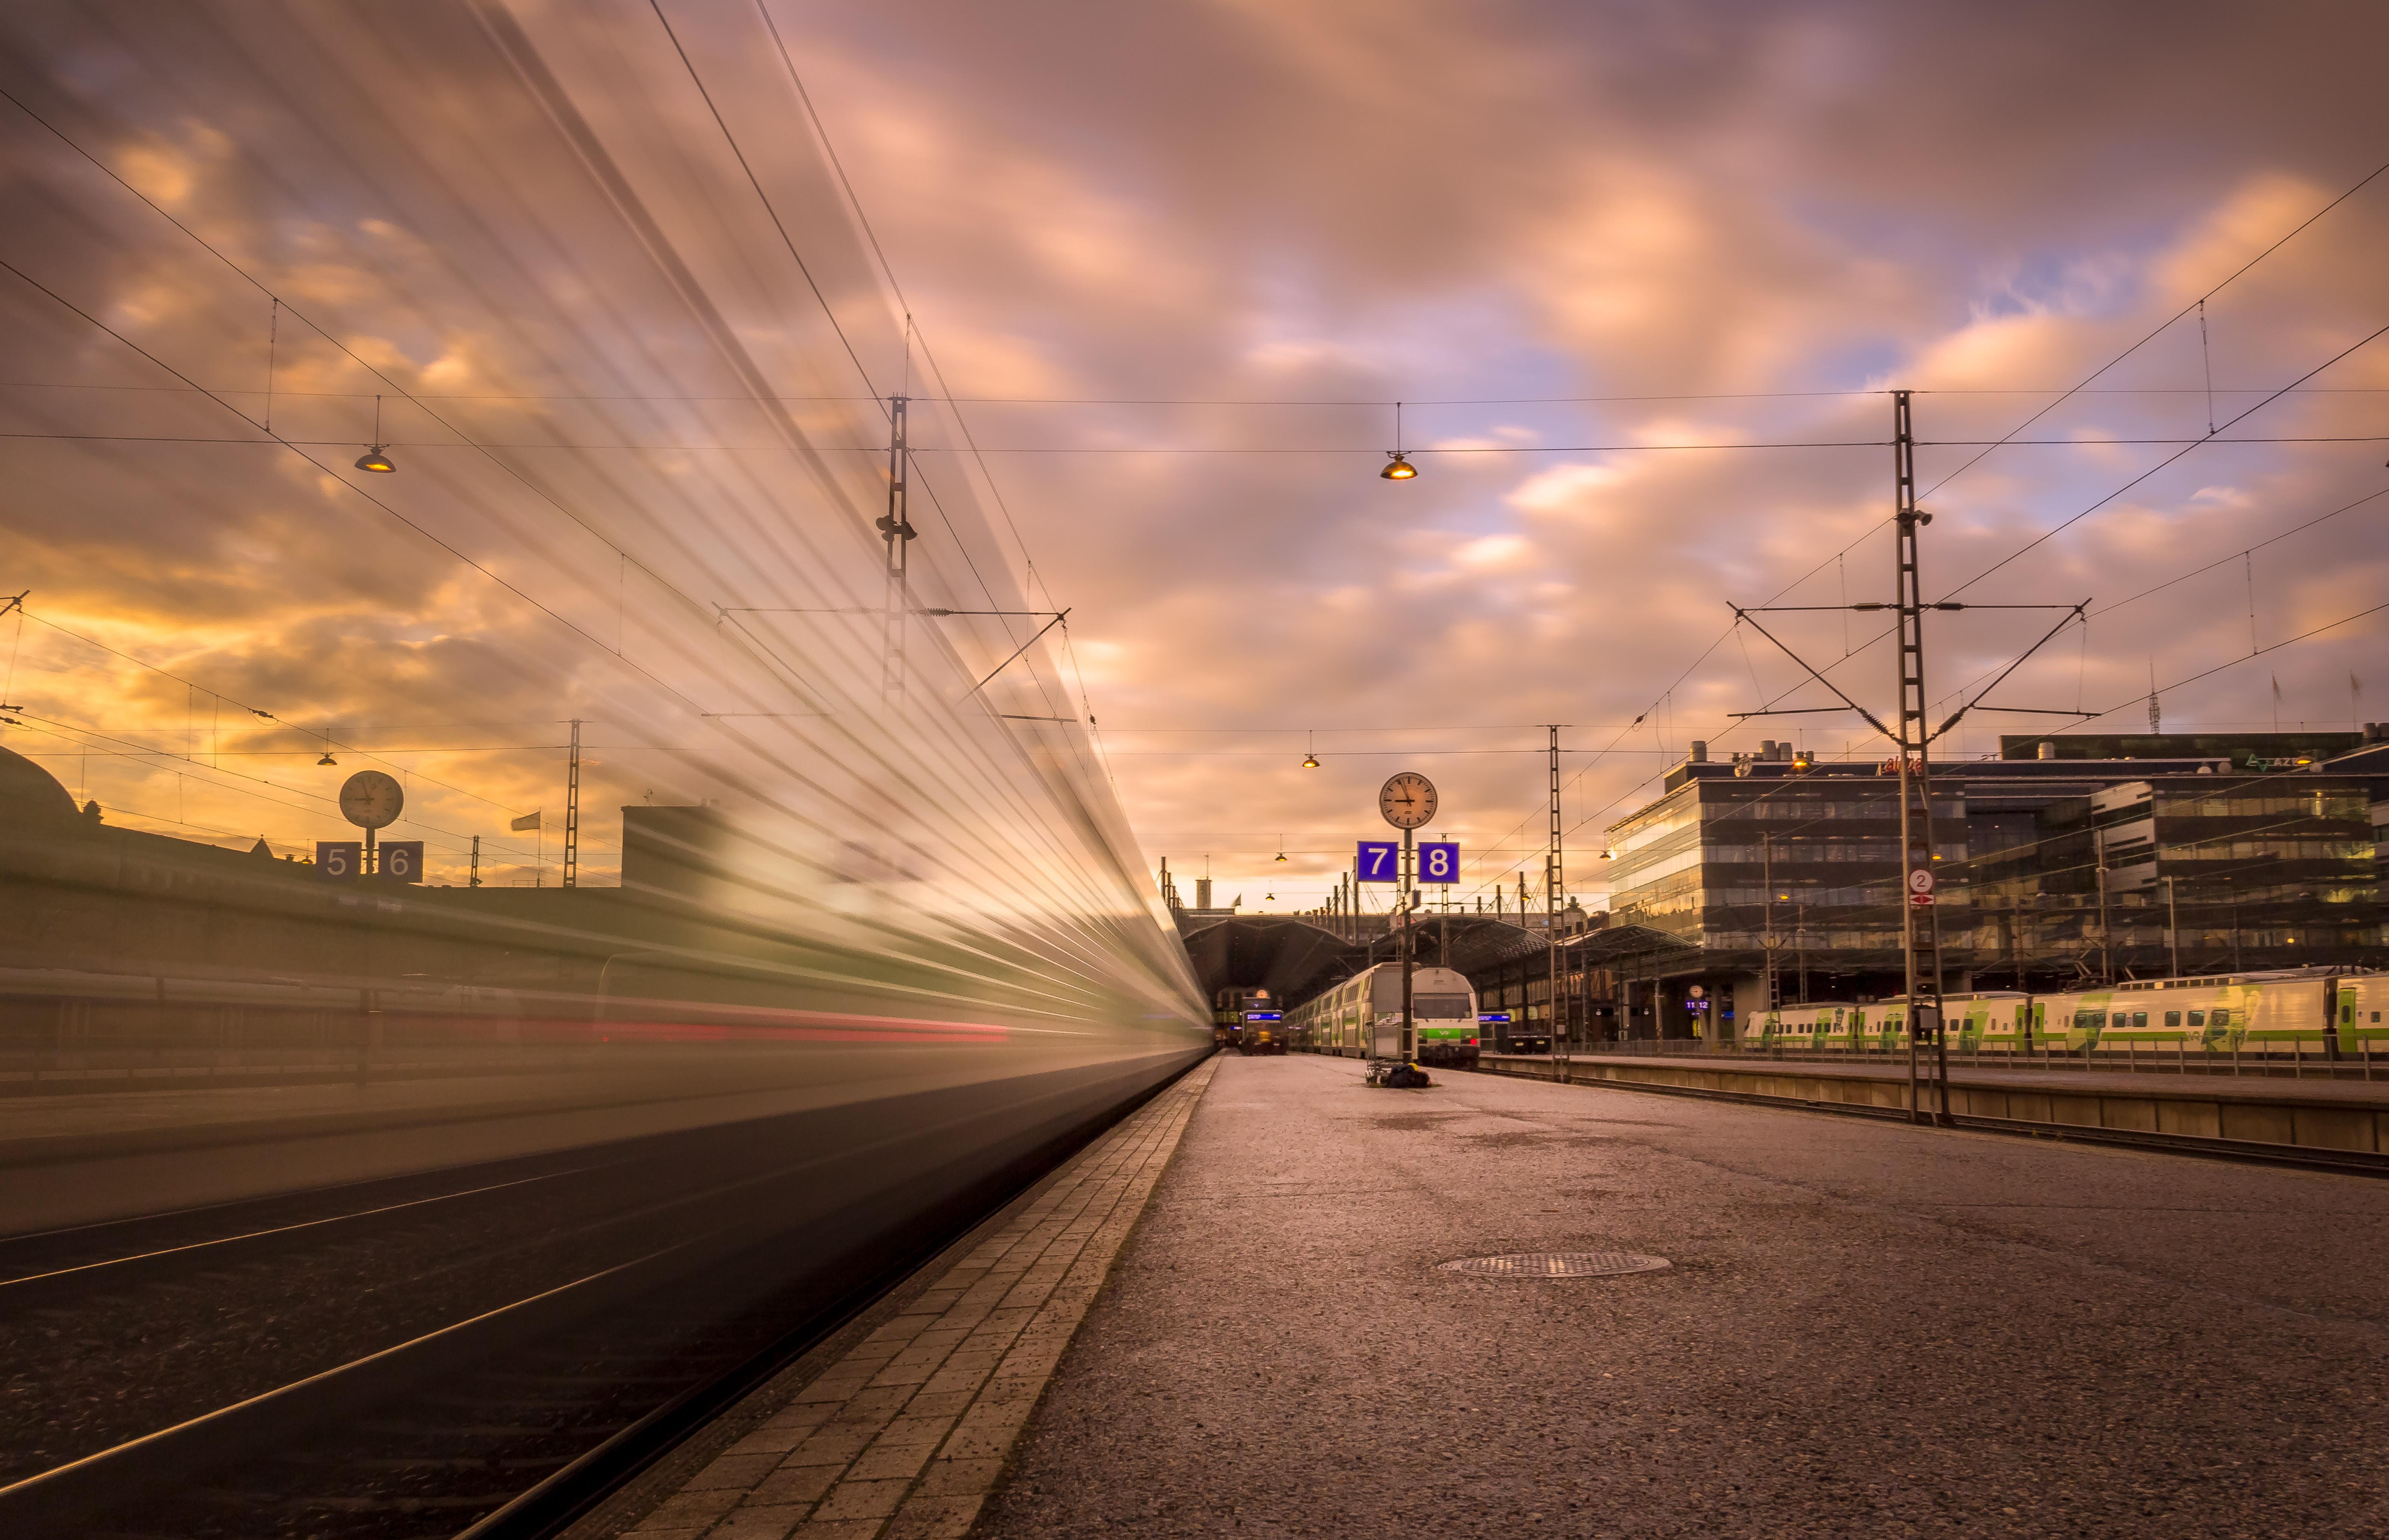 photo of train near station